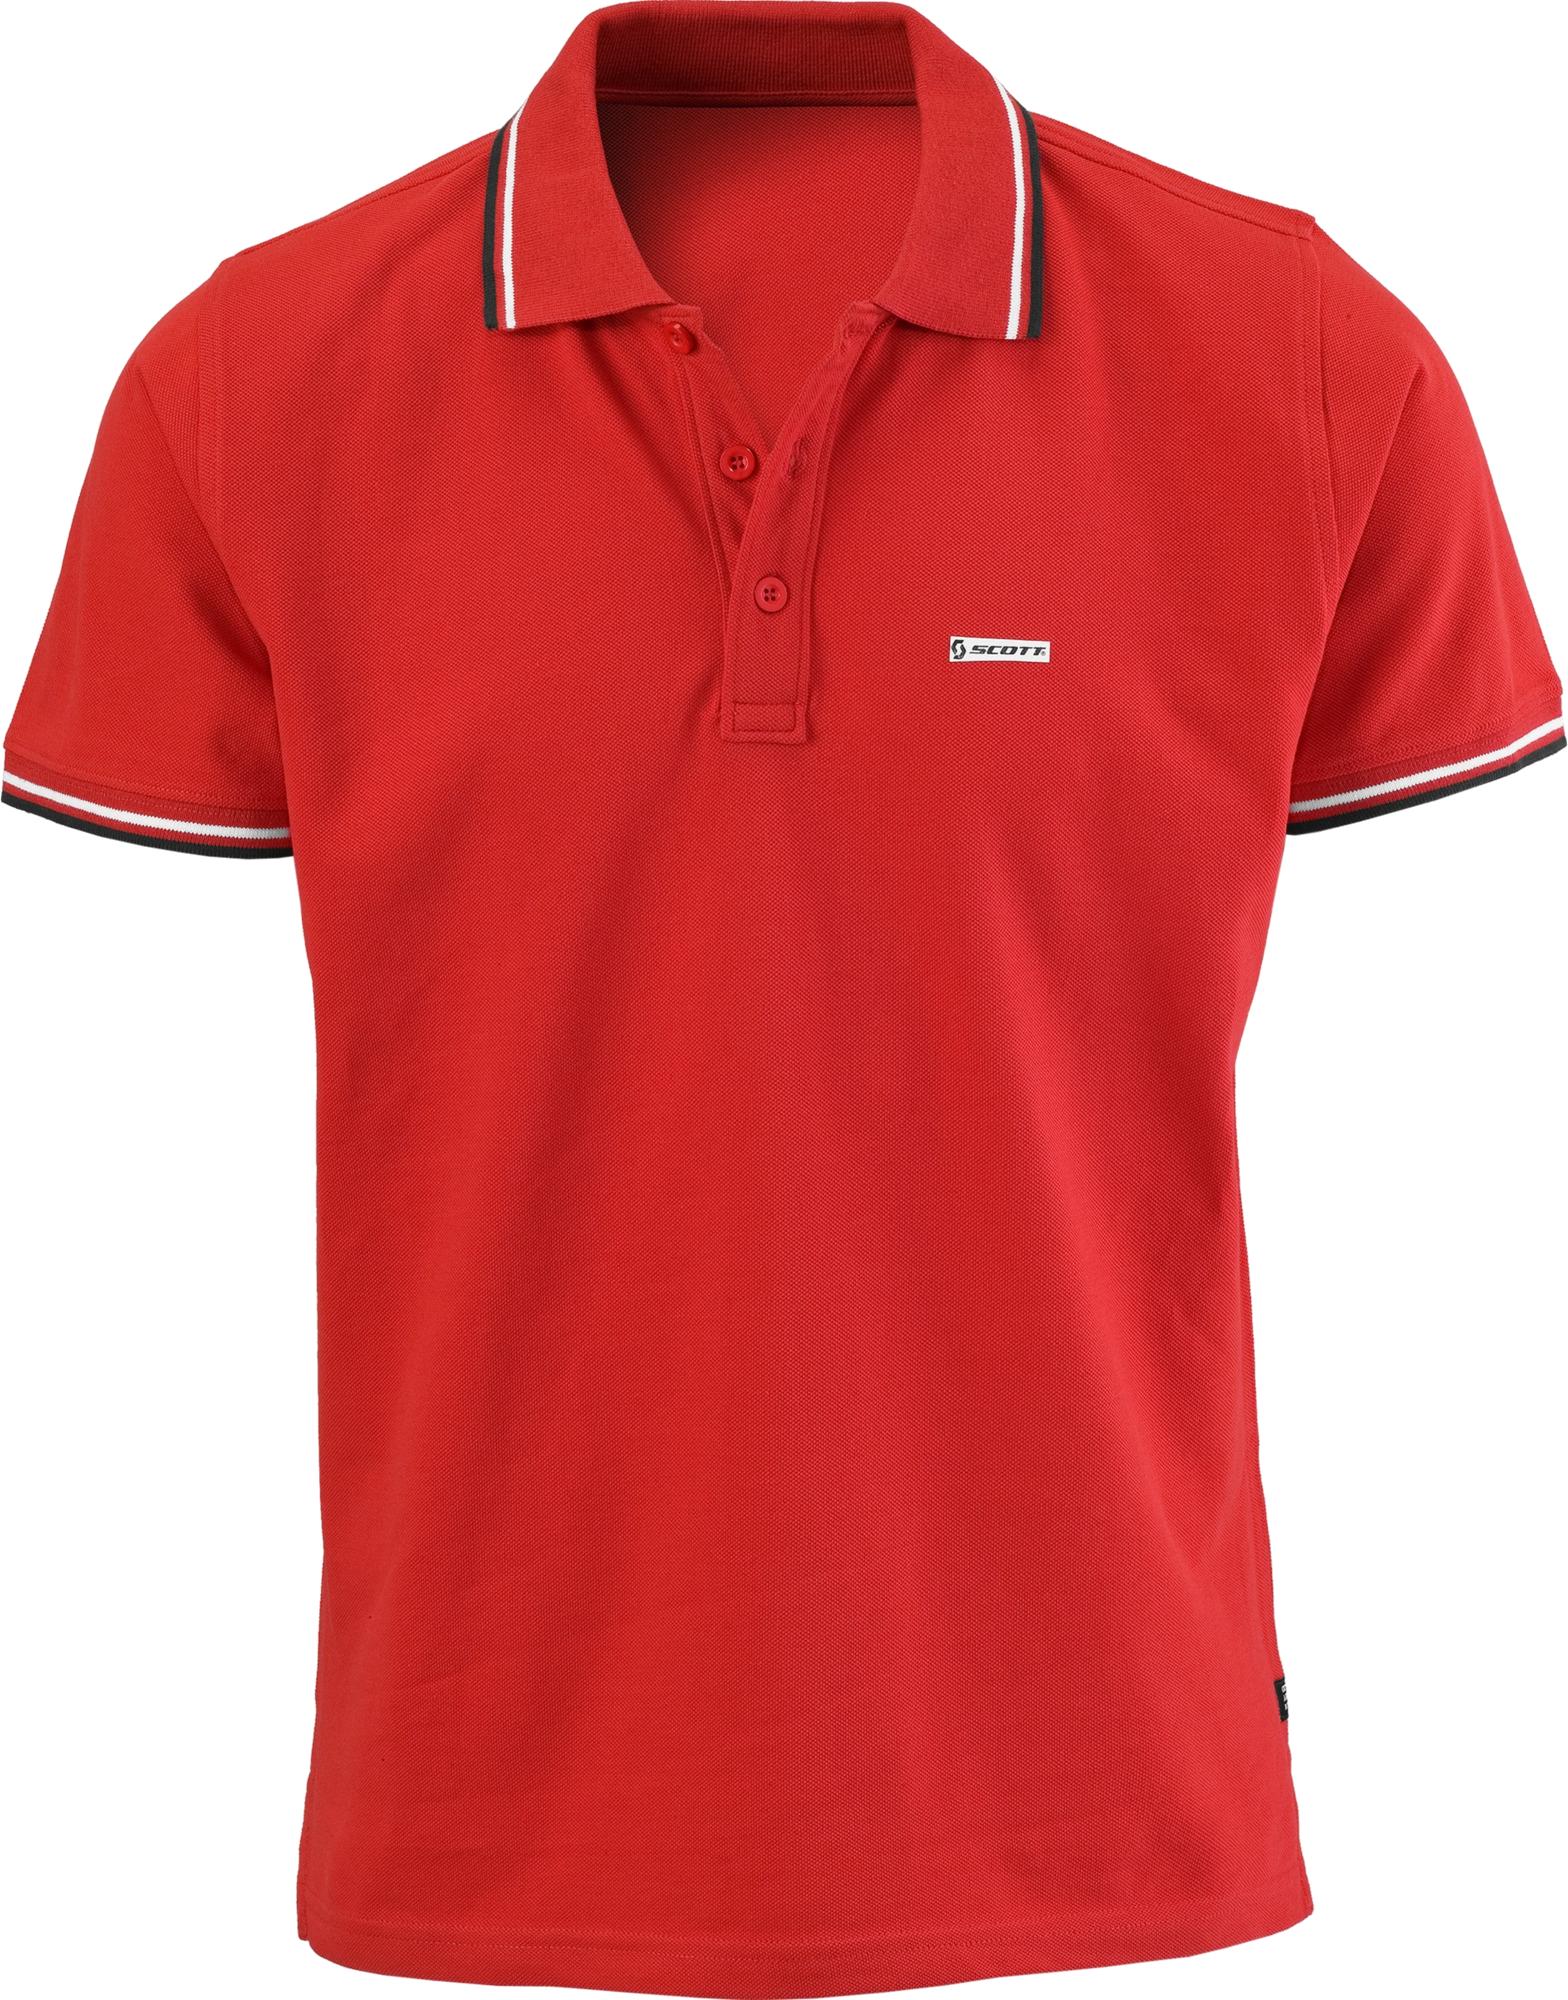 Poloshirt HD PNG - 117727